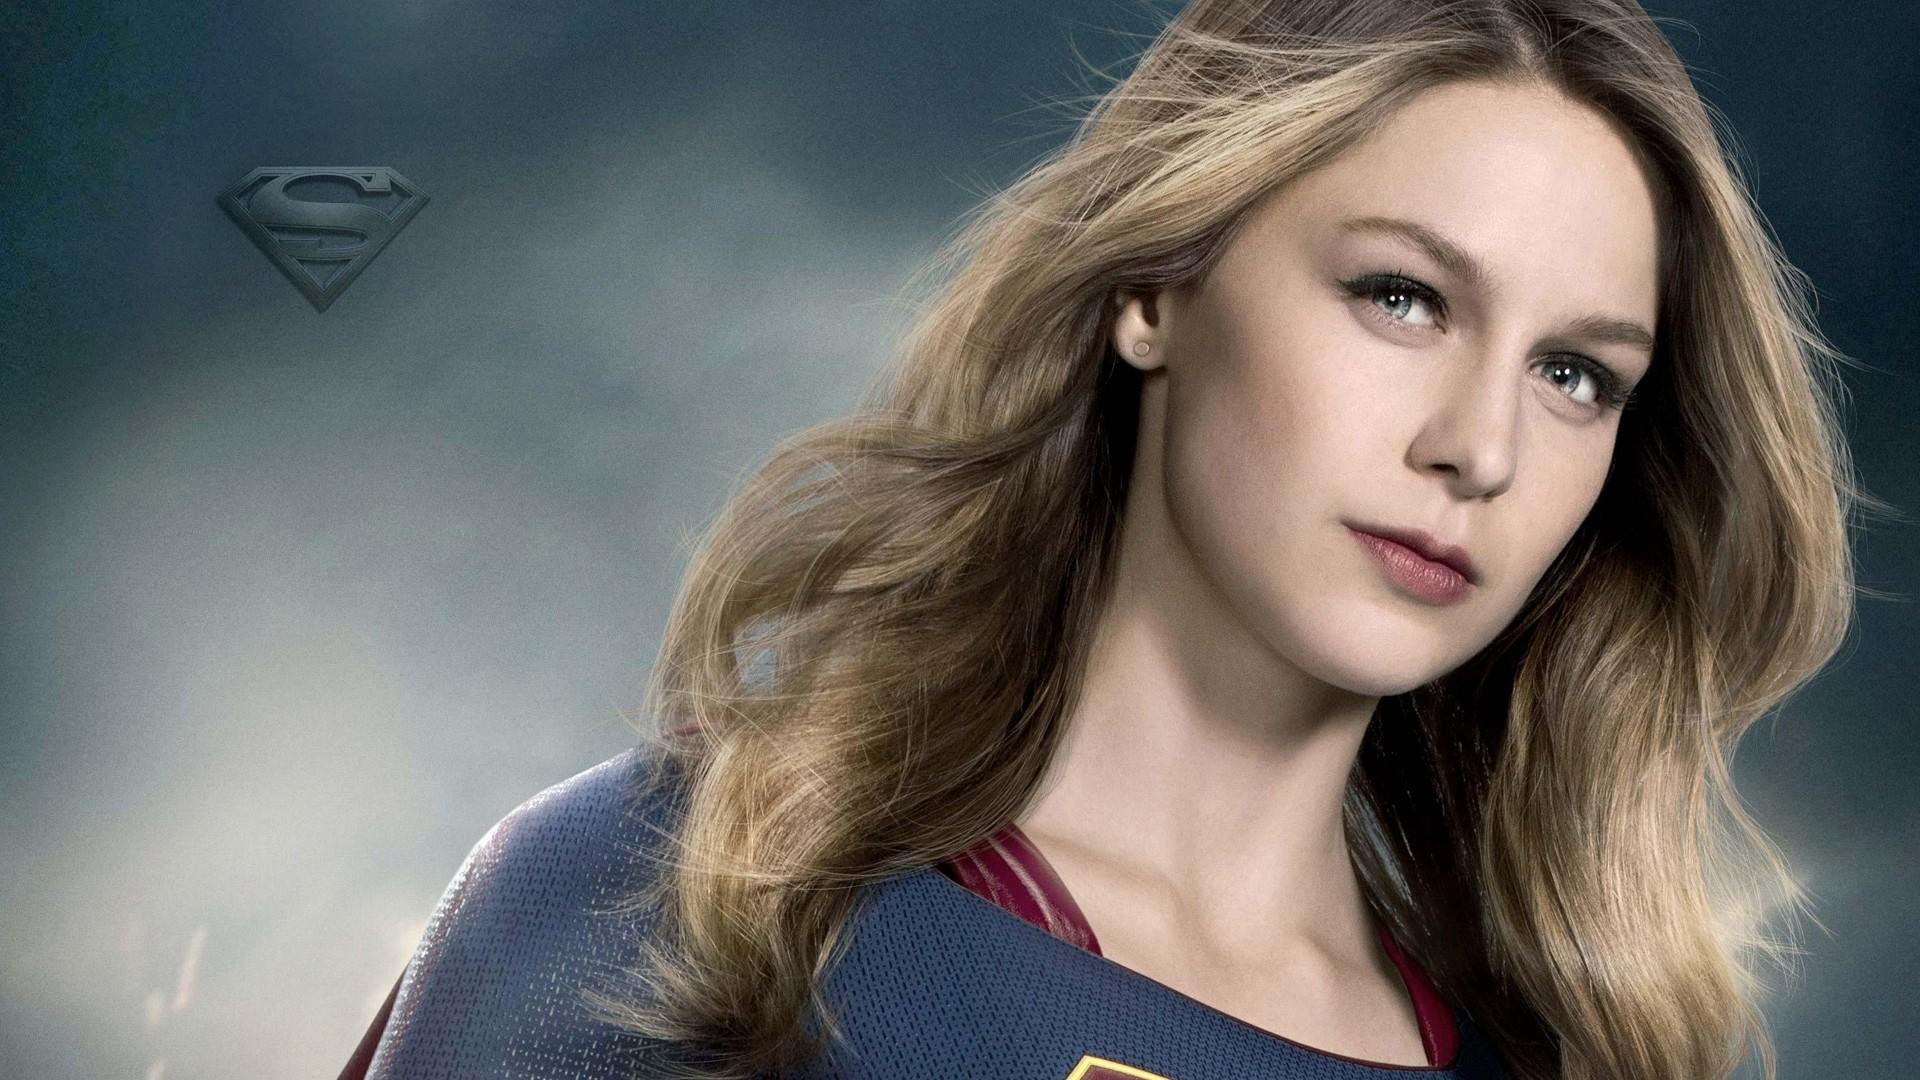 Gravity Falls Wallpapers Hd 1080p Supergirl Melissa Benoist Season 2 Wallpapers Hd